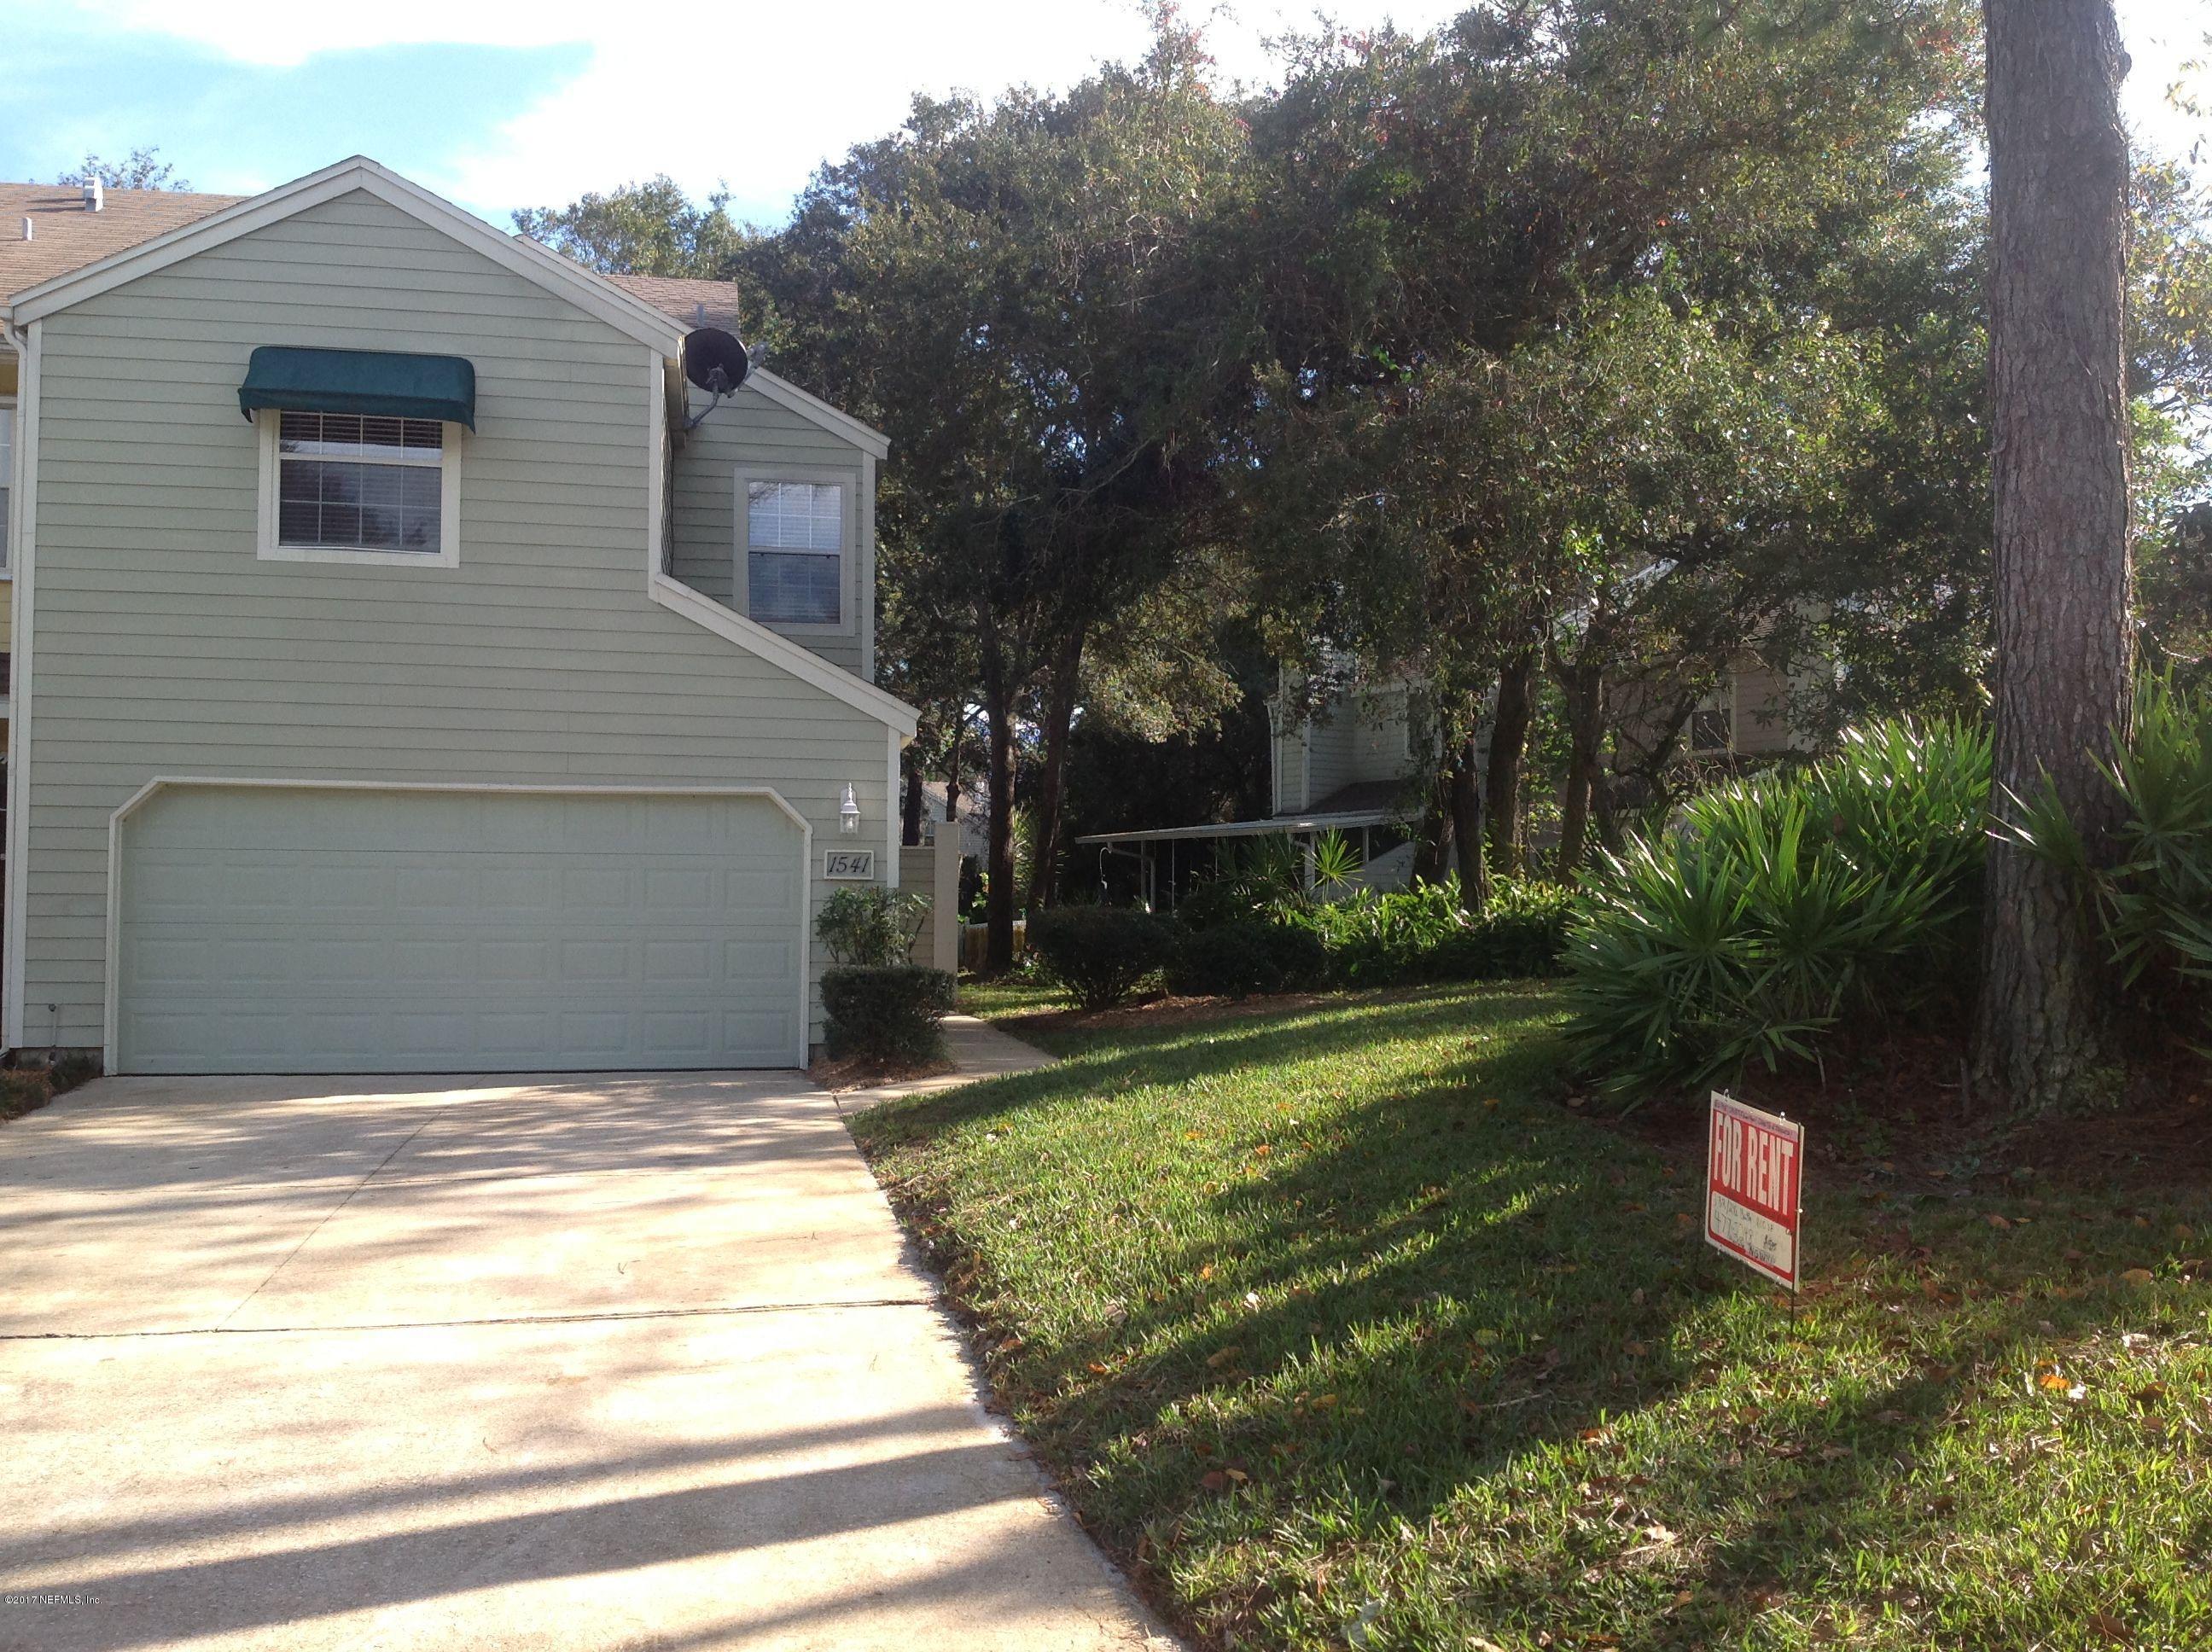 1541 SUMMER SANDS,NEPTUNE BEACH,FLORIDA 32266,3 Bedrooms Bedrooms,2 BathroomsBathrooms,Residential - townhome,SUMMER SANDS,866183